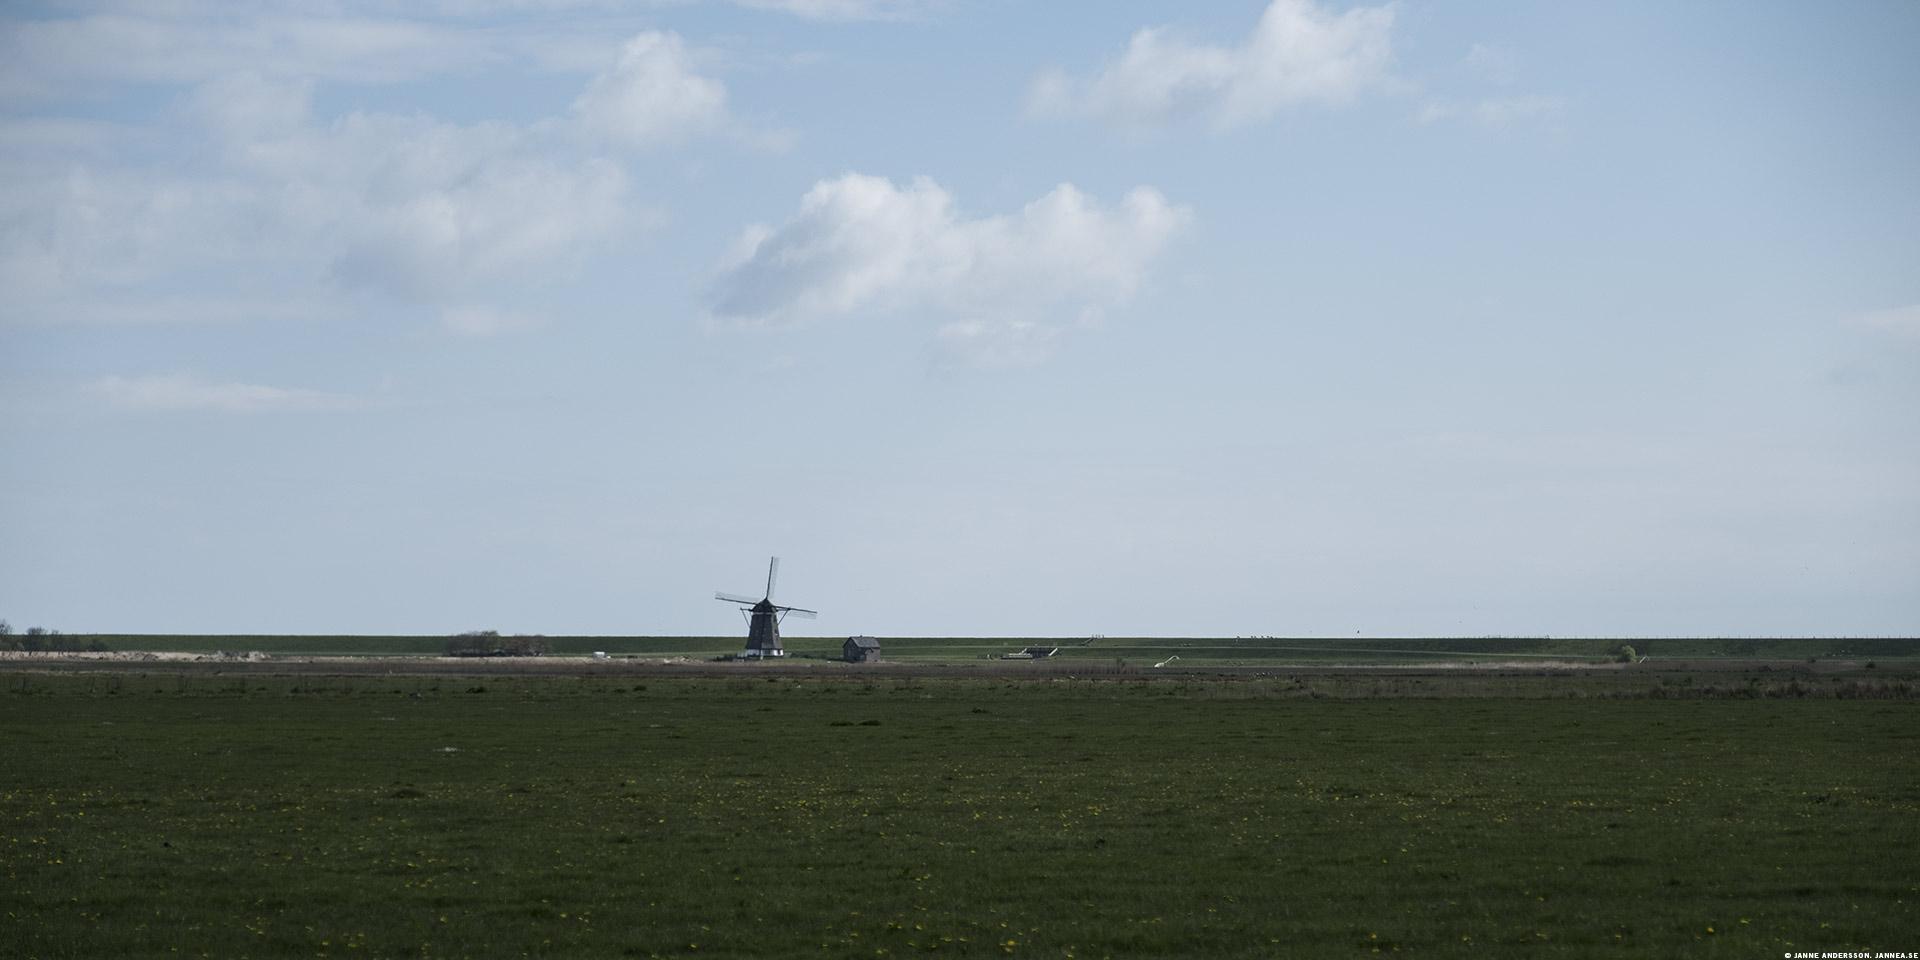 En väderkvarn i Holland |© Janne A